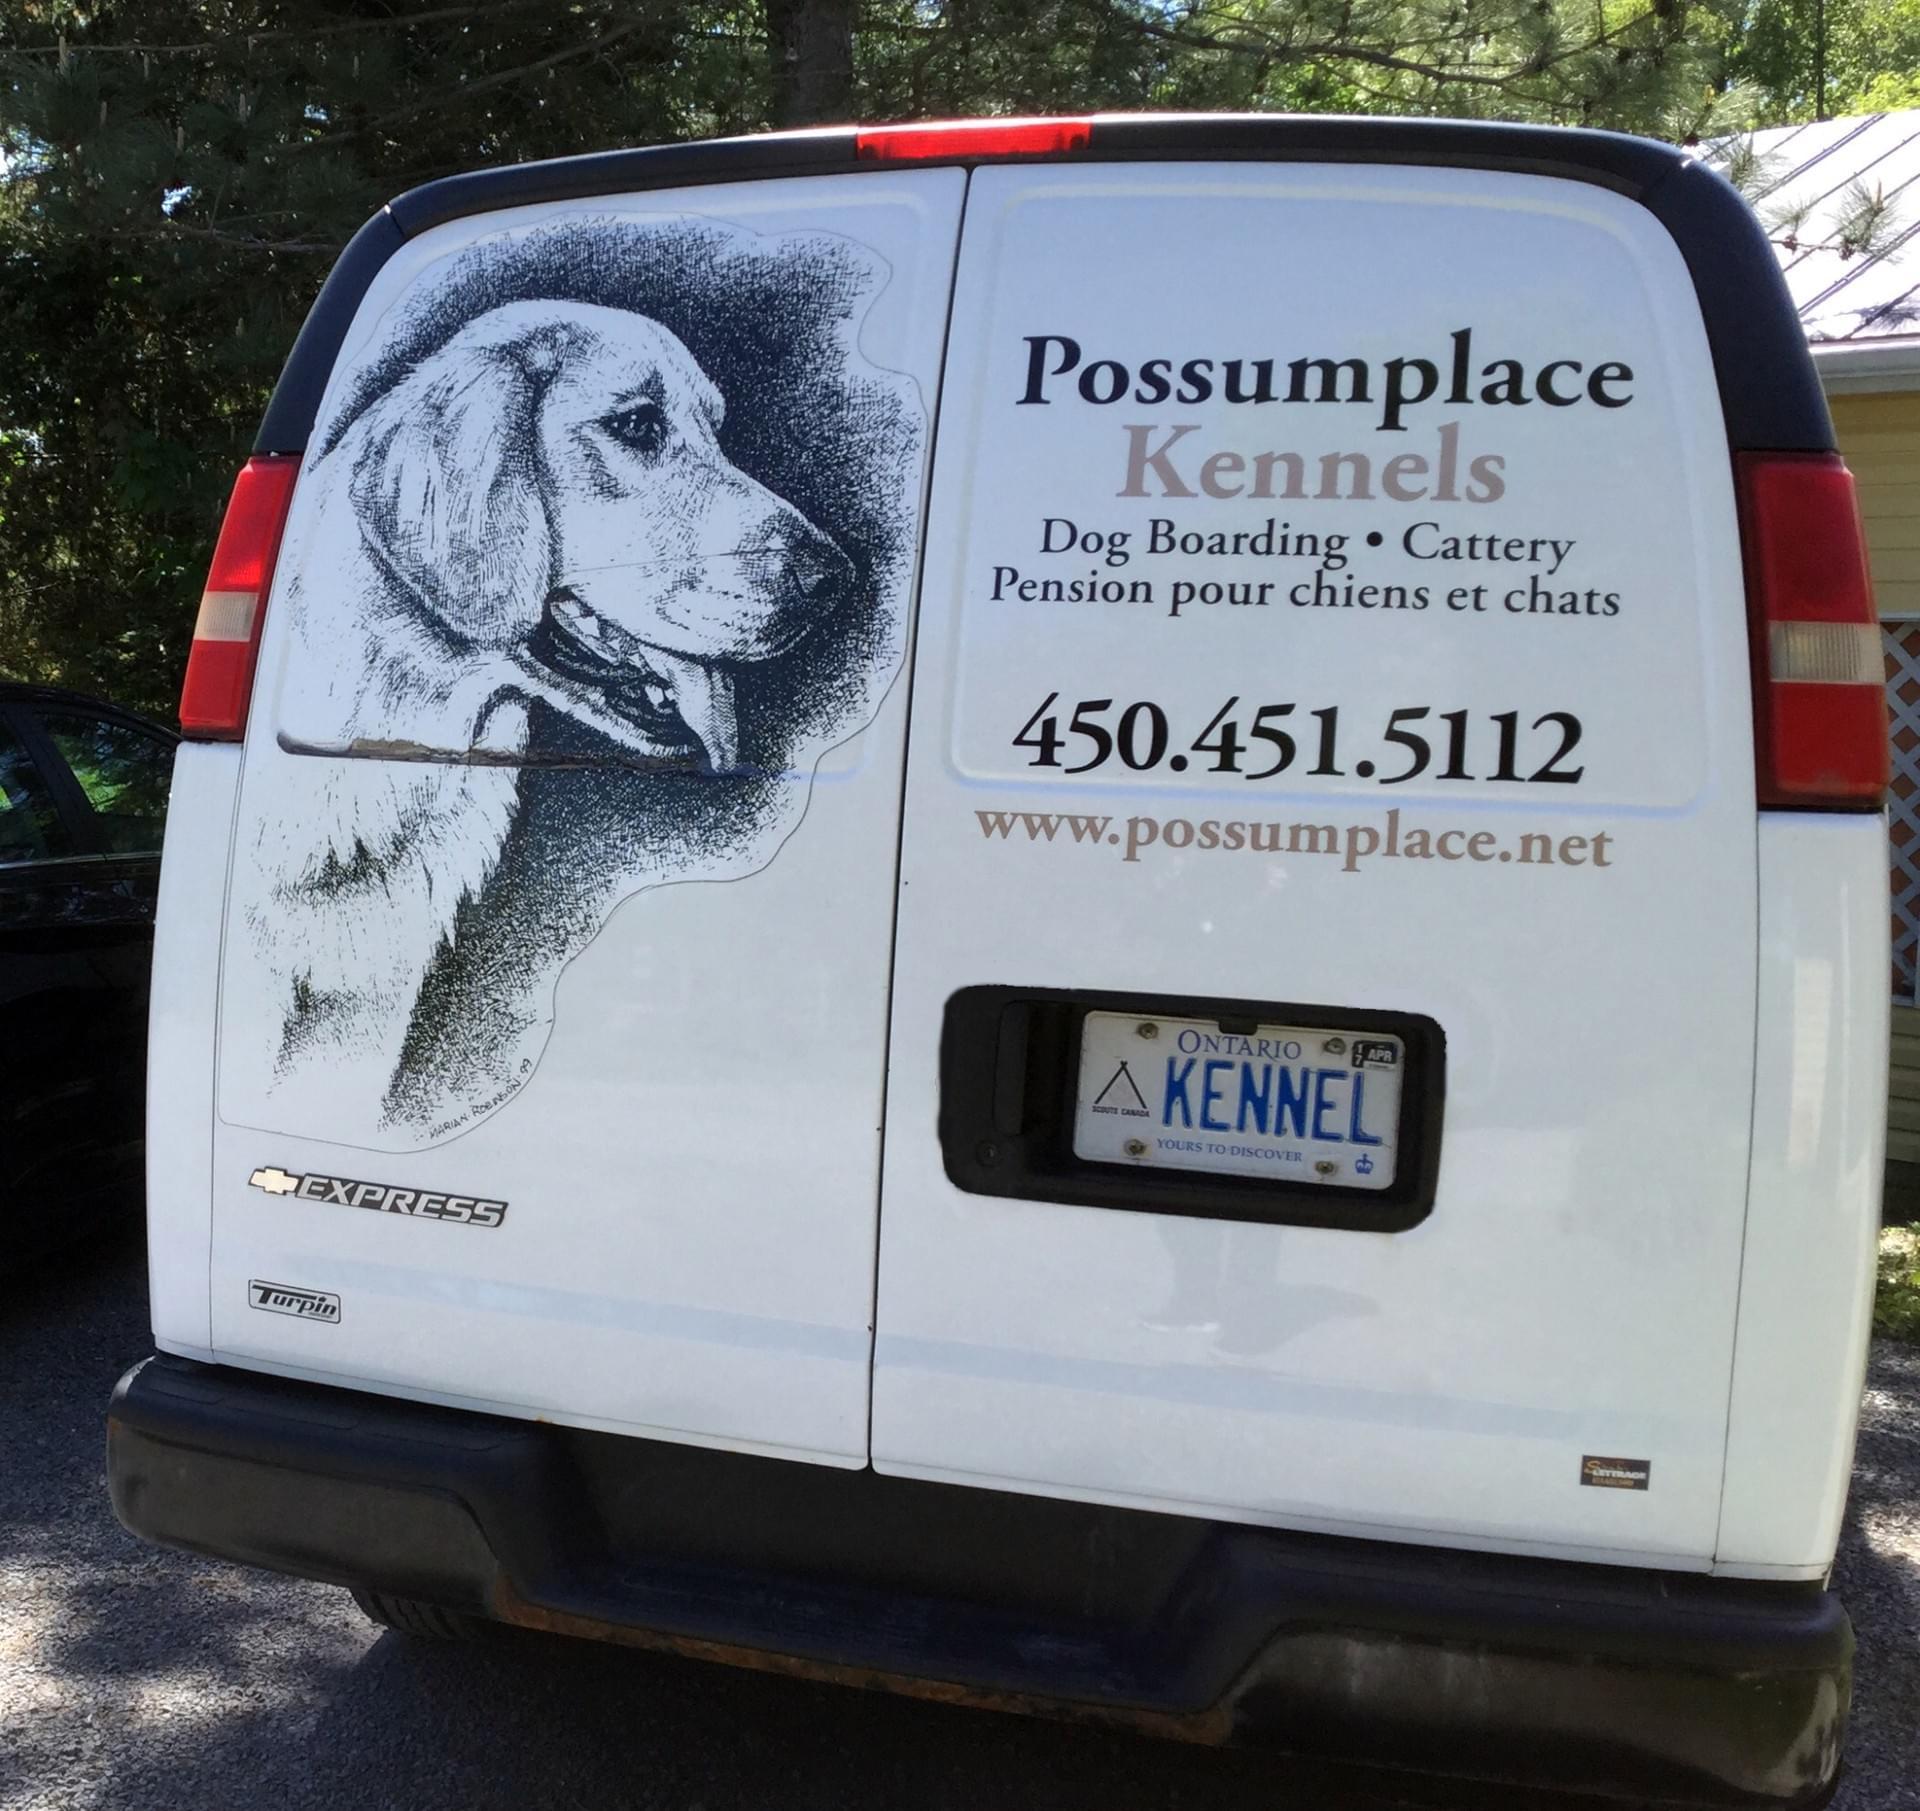 Possumplace Kennels